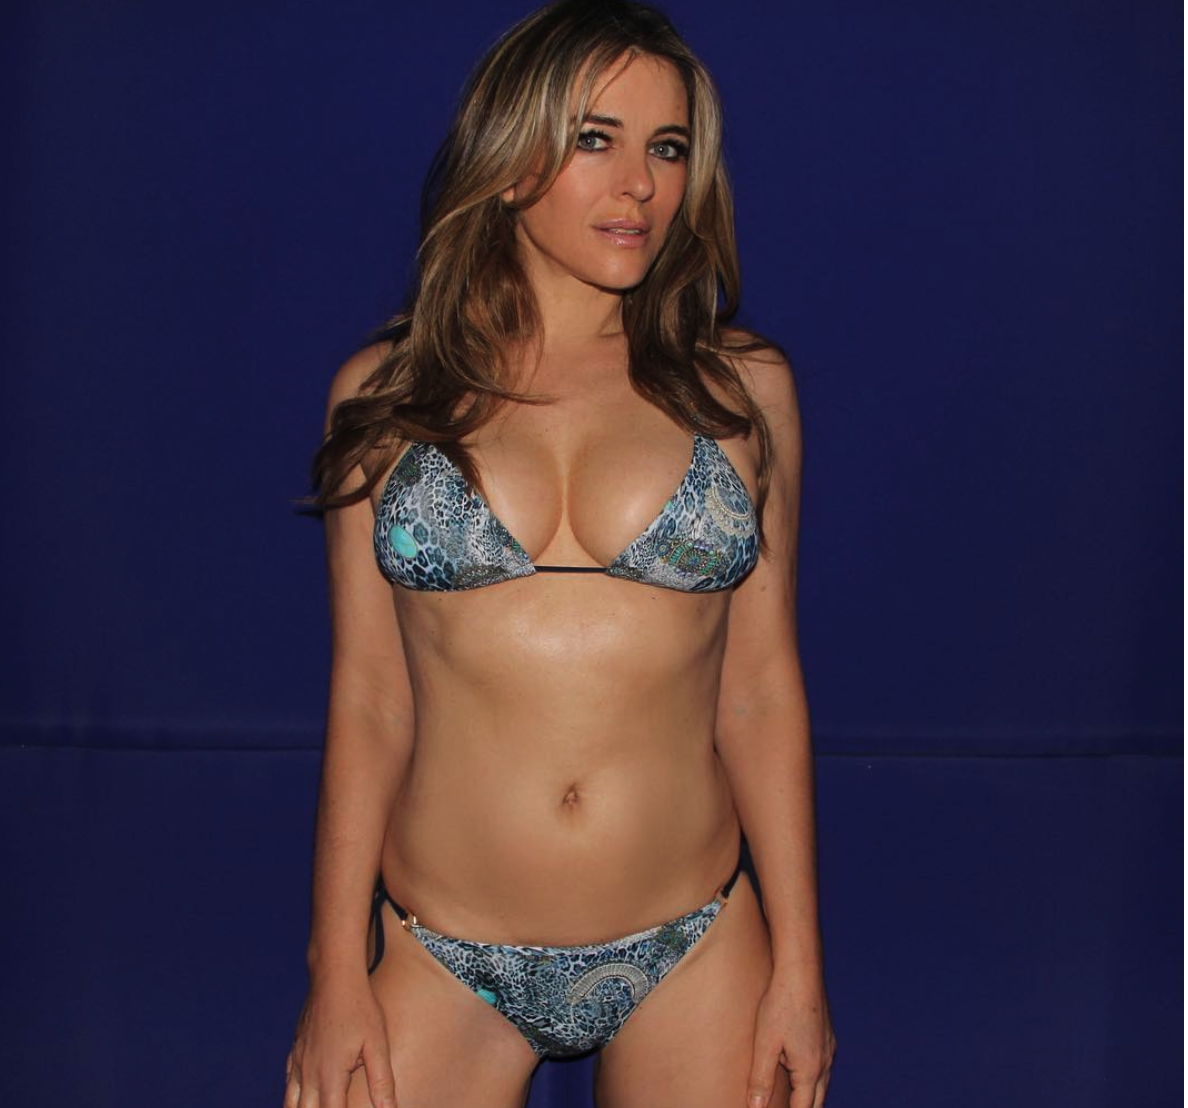 Ageless Elizabeth Hurley Flaunts Her Sextastic Bikini Body